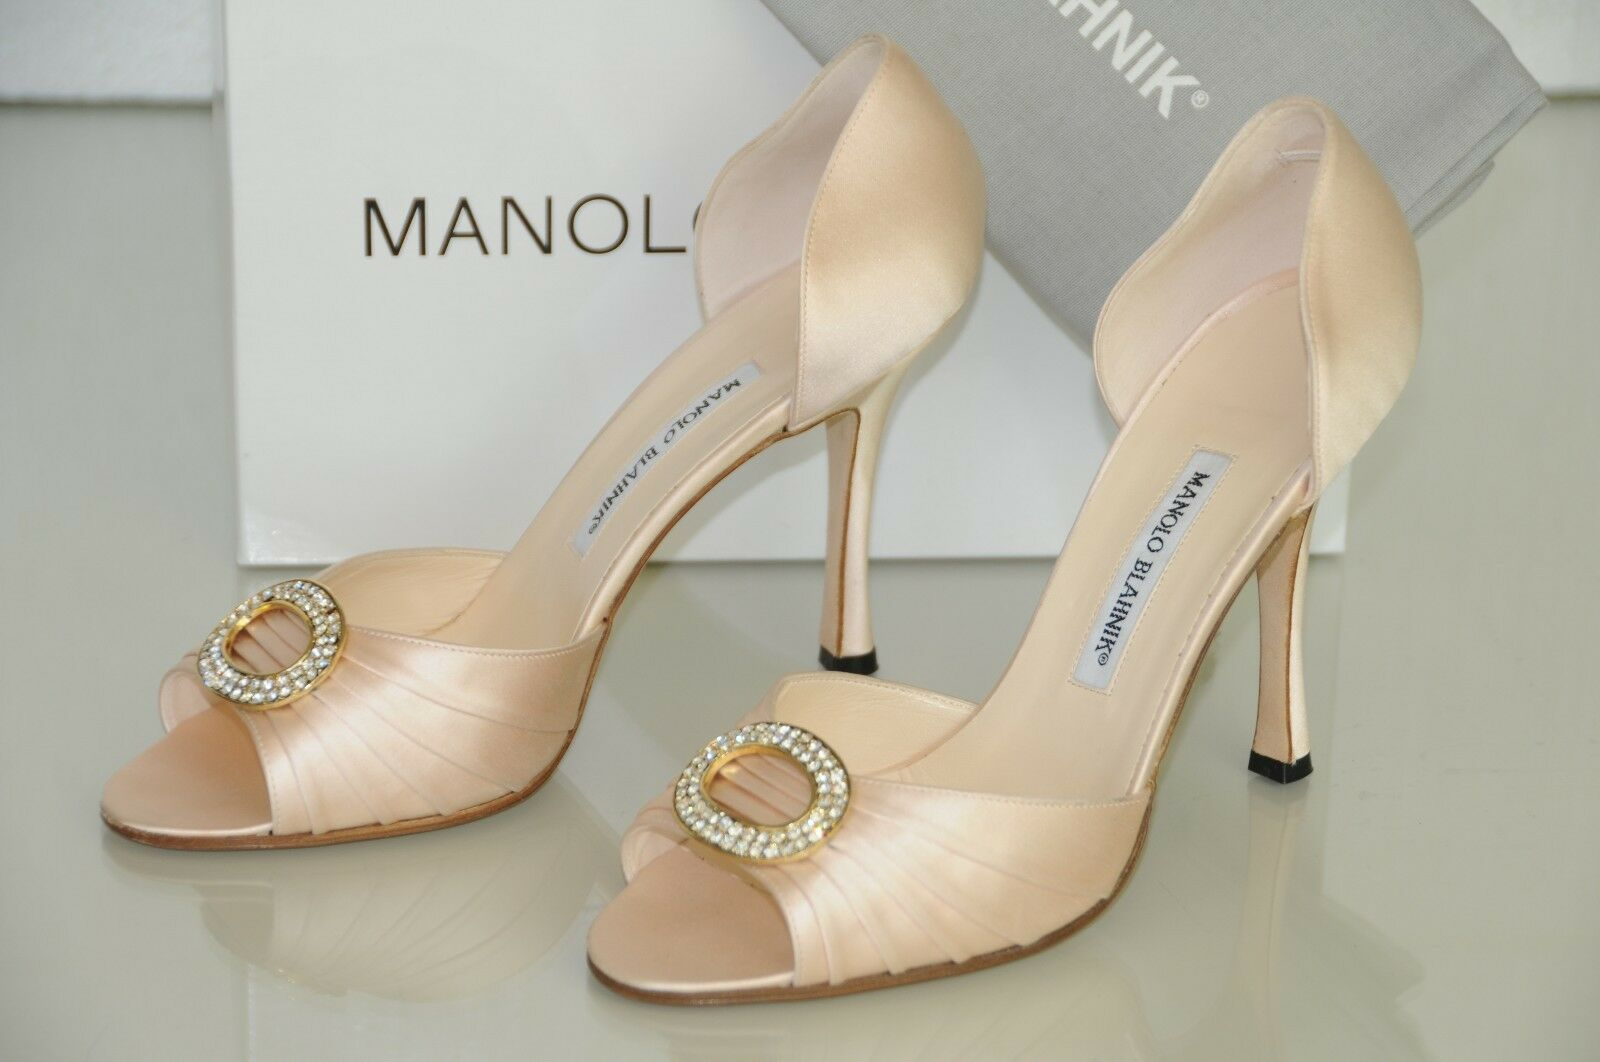 i nuovi marchi outlet online New MANOLO MANOLO MANOLO BLAHNIK SEDARABY Flesh Pale NUDE rosa Satin Jeweled scarpe 40 Wedding  forniamo il meglio